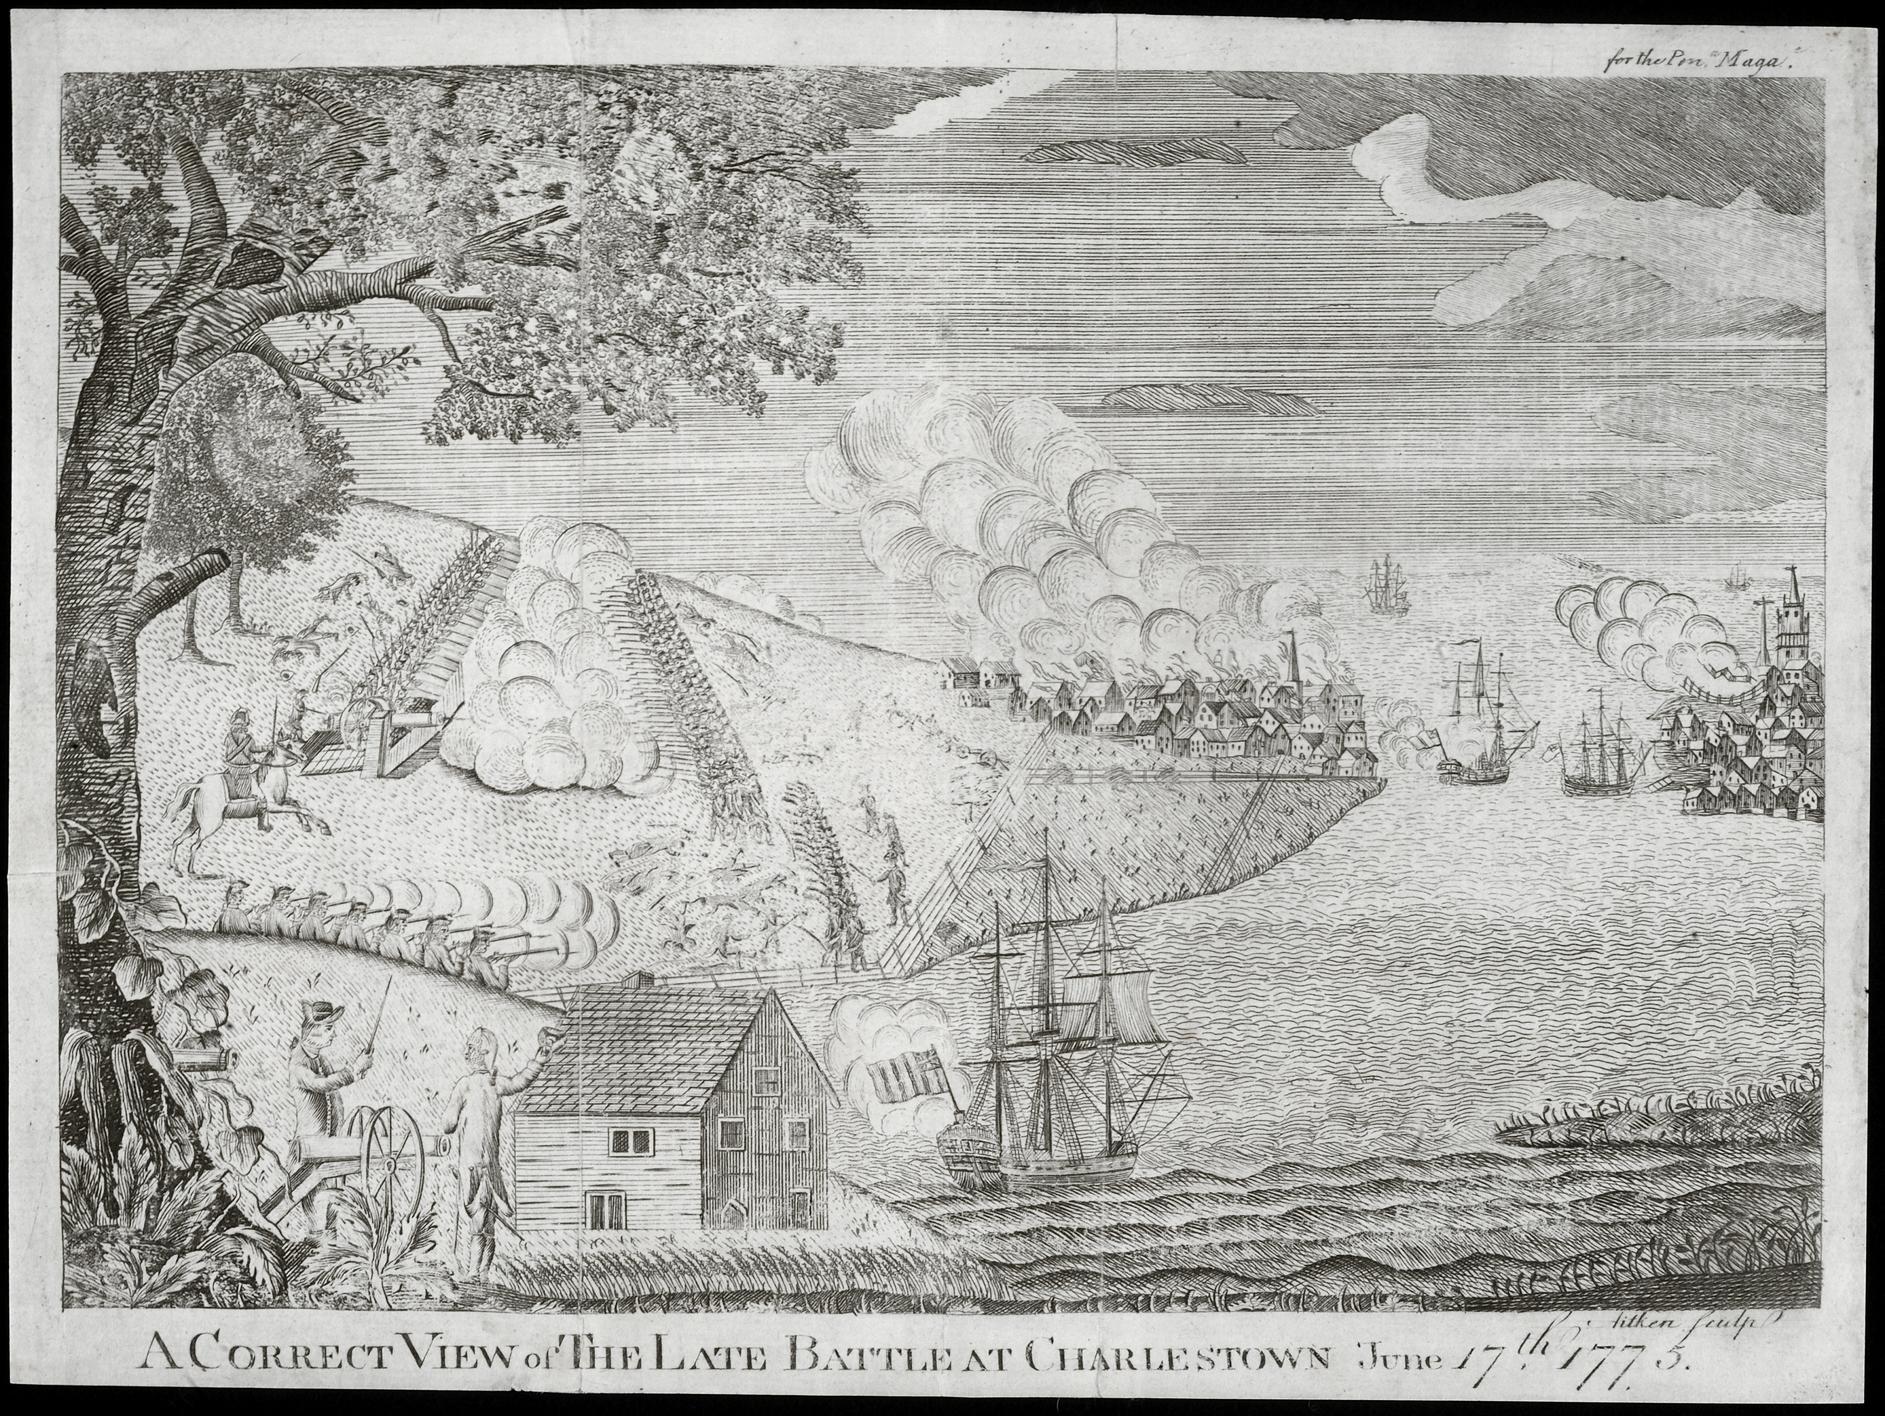 A Correct View of The Late Battle at Charlestown June 17th. 1775, Robert Aitken, Philadelphia: Robert Aitken, 1775